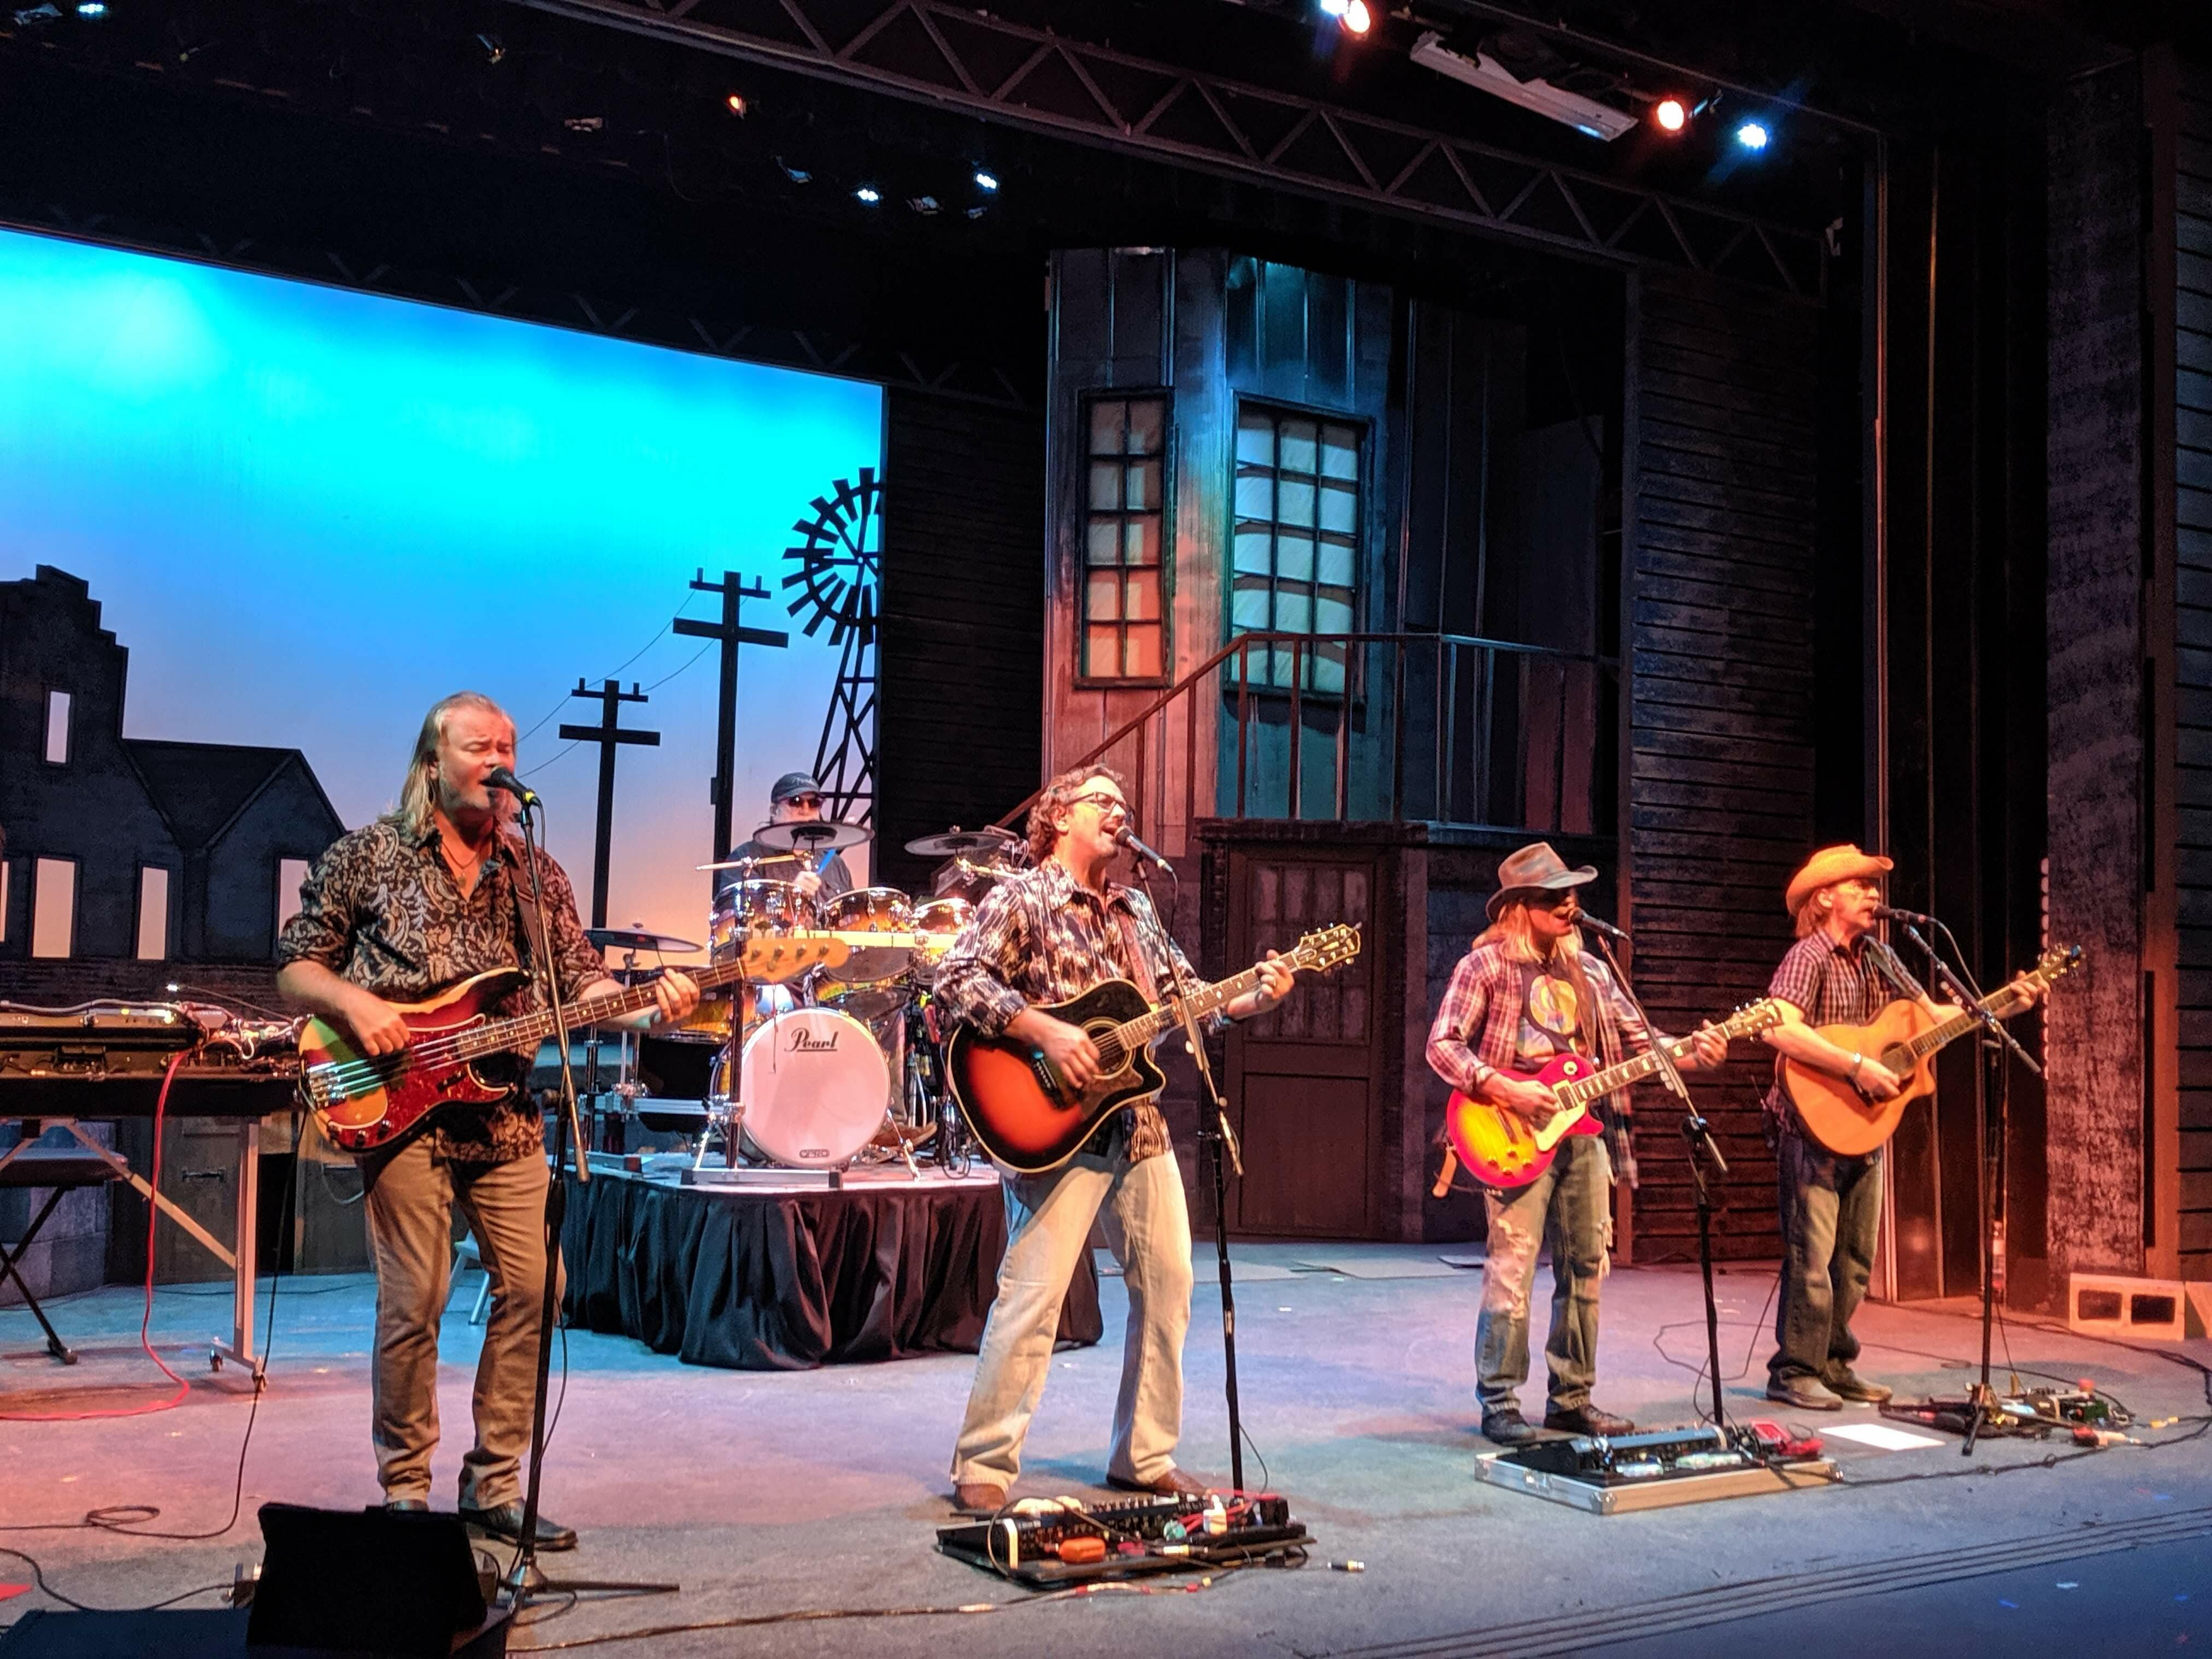 Outdoor concert at the Daytona Beach Bandshell